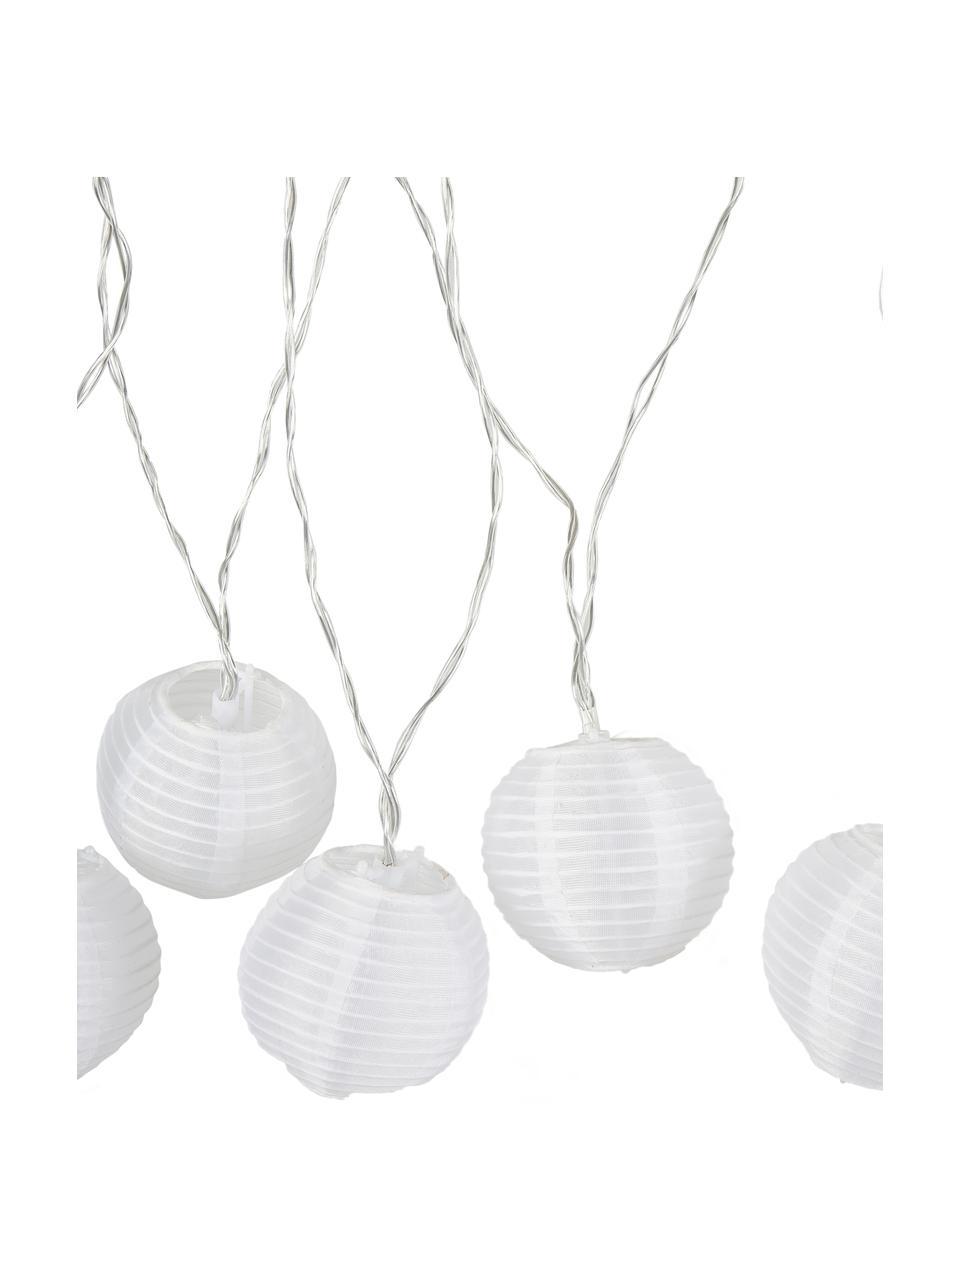 Girlanda świetlna LED Lampion, Biały, D 450 cm